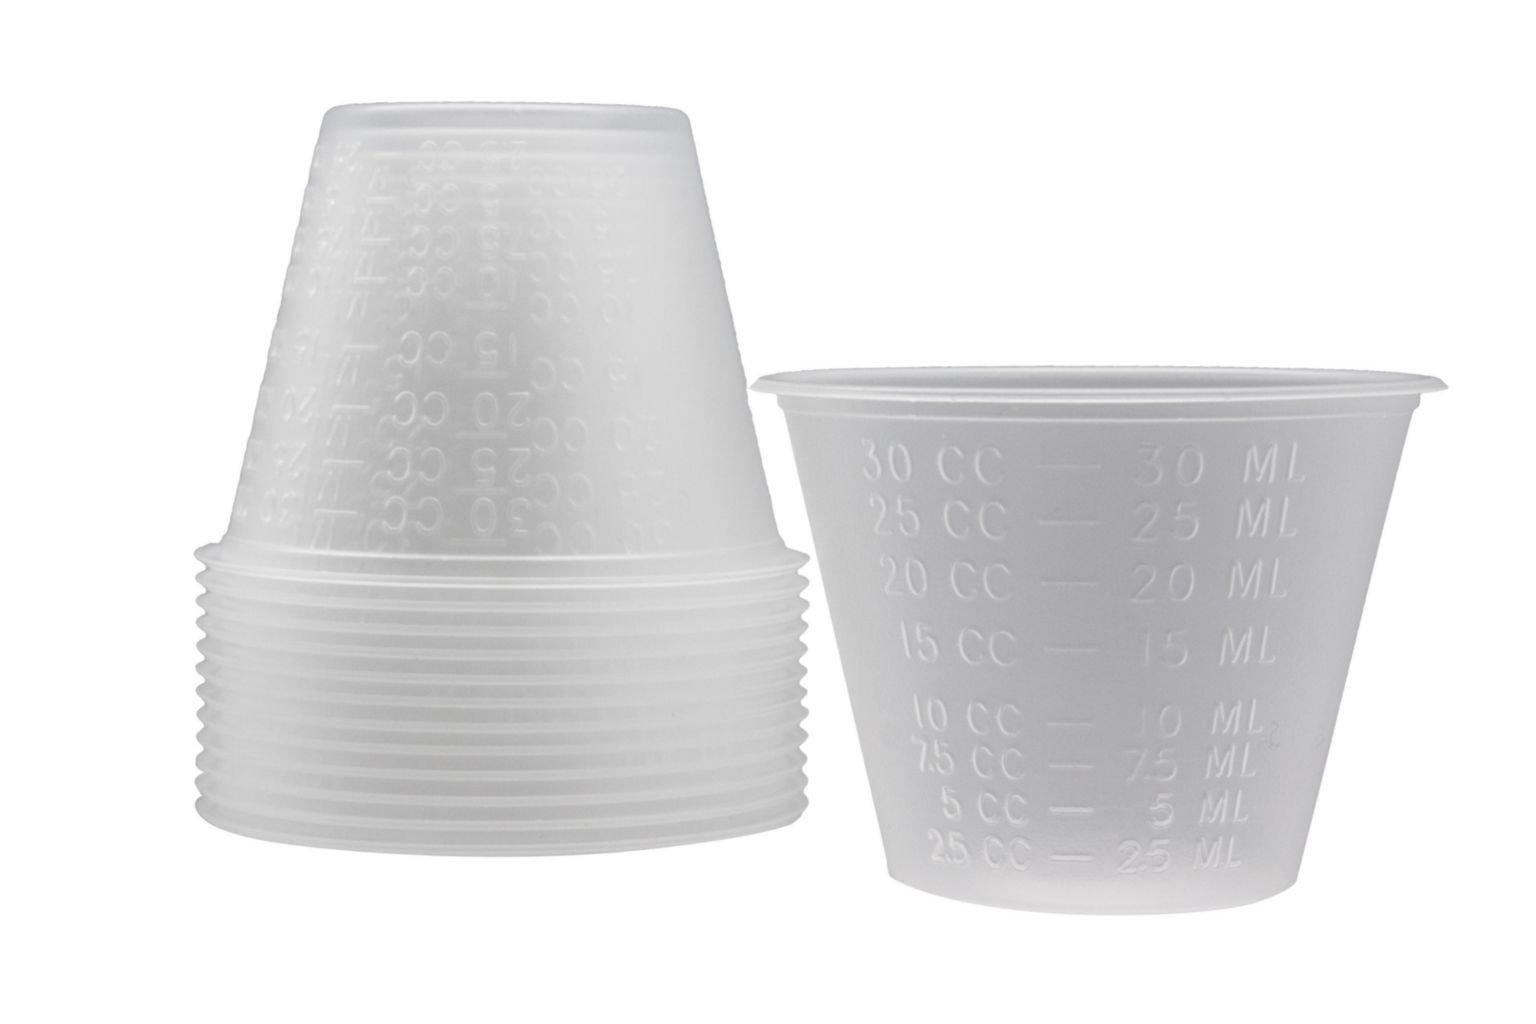 DUKAL 9007-M Medicine Cup, 1 oz, Translucent (Pack of 5000)